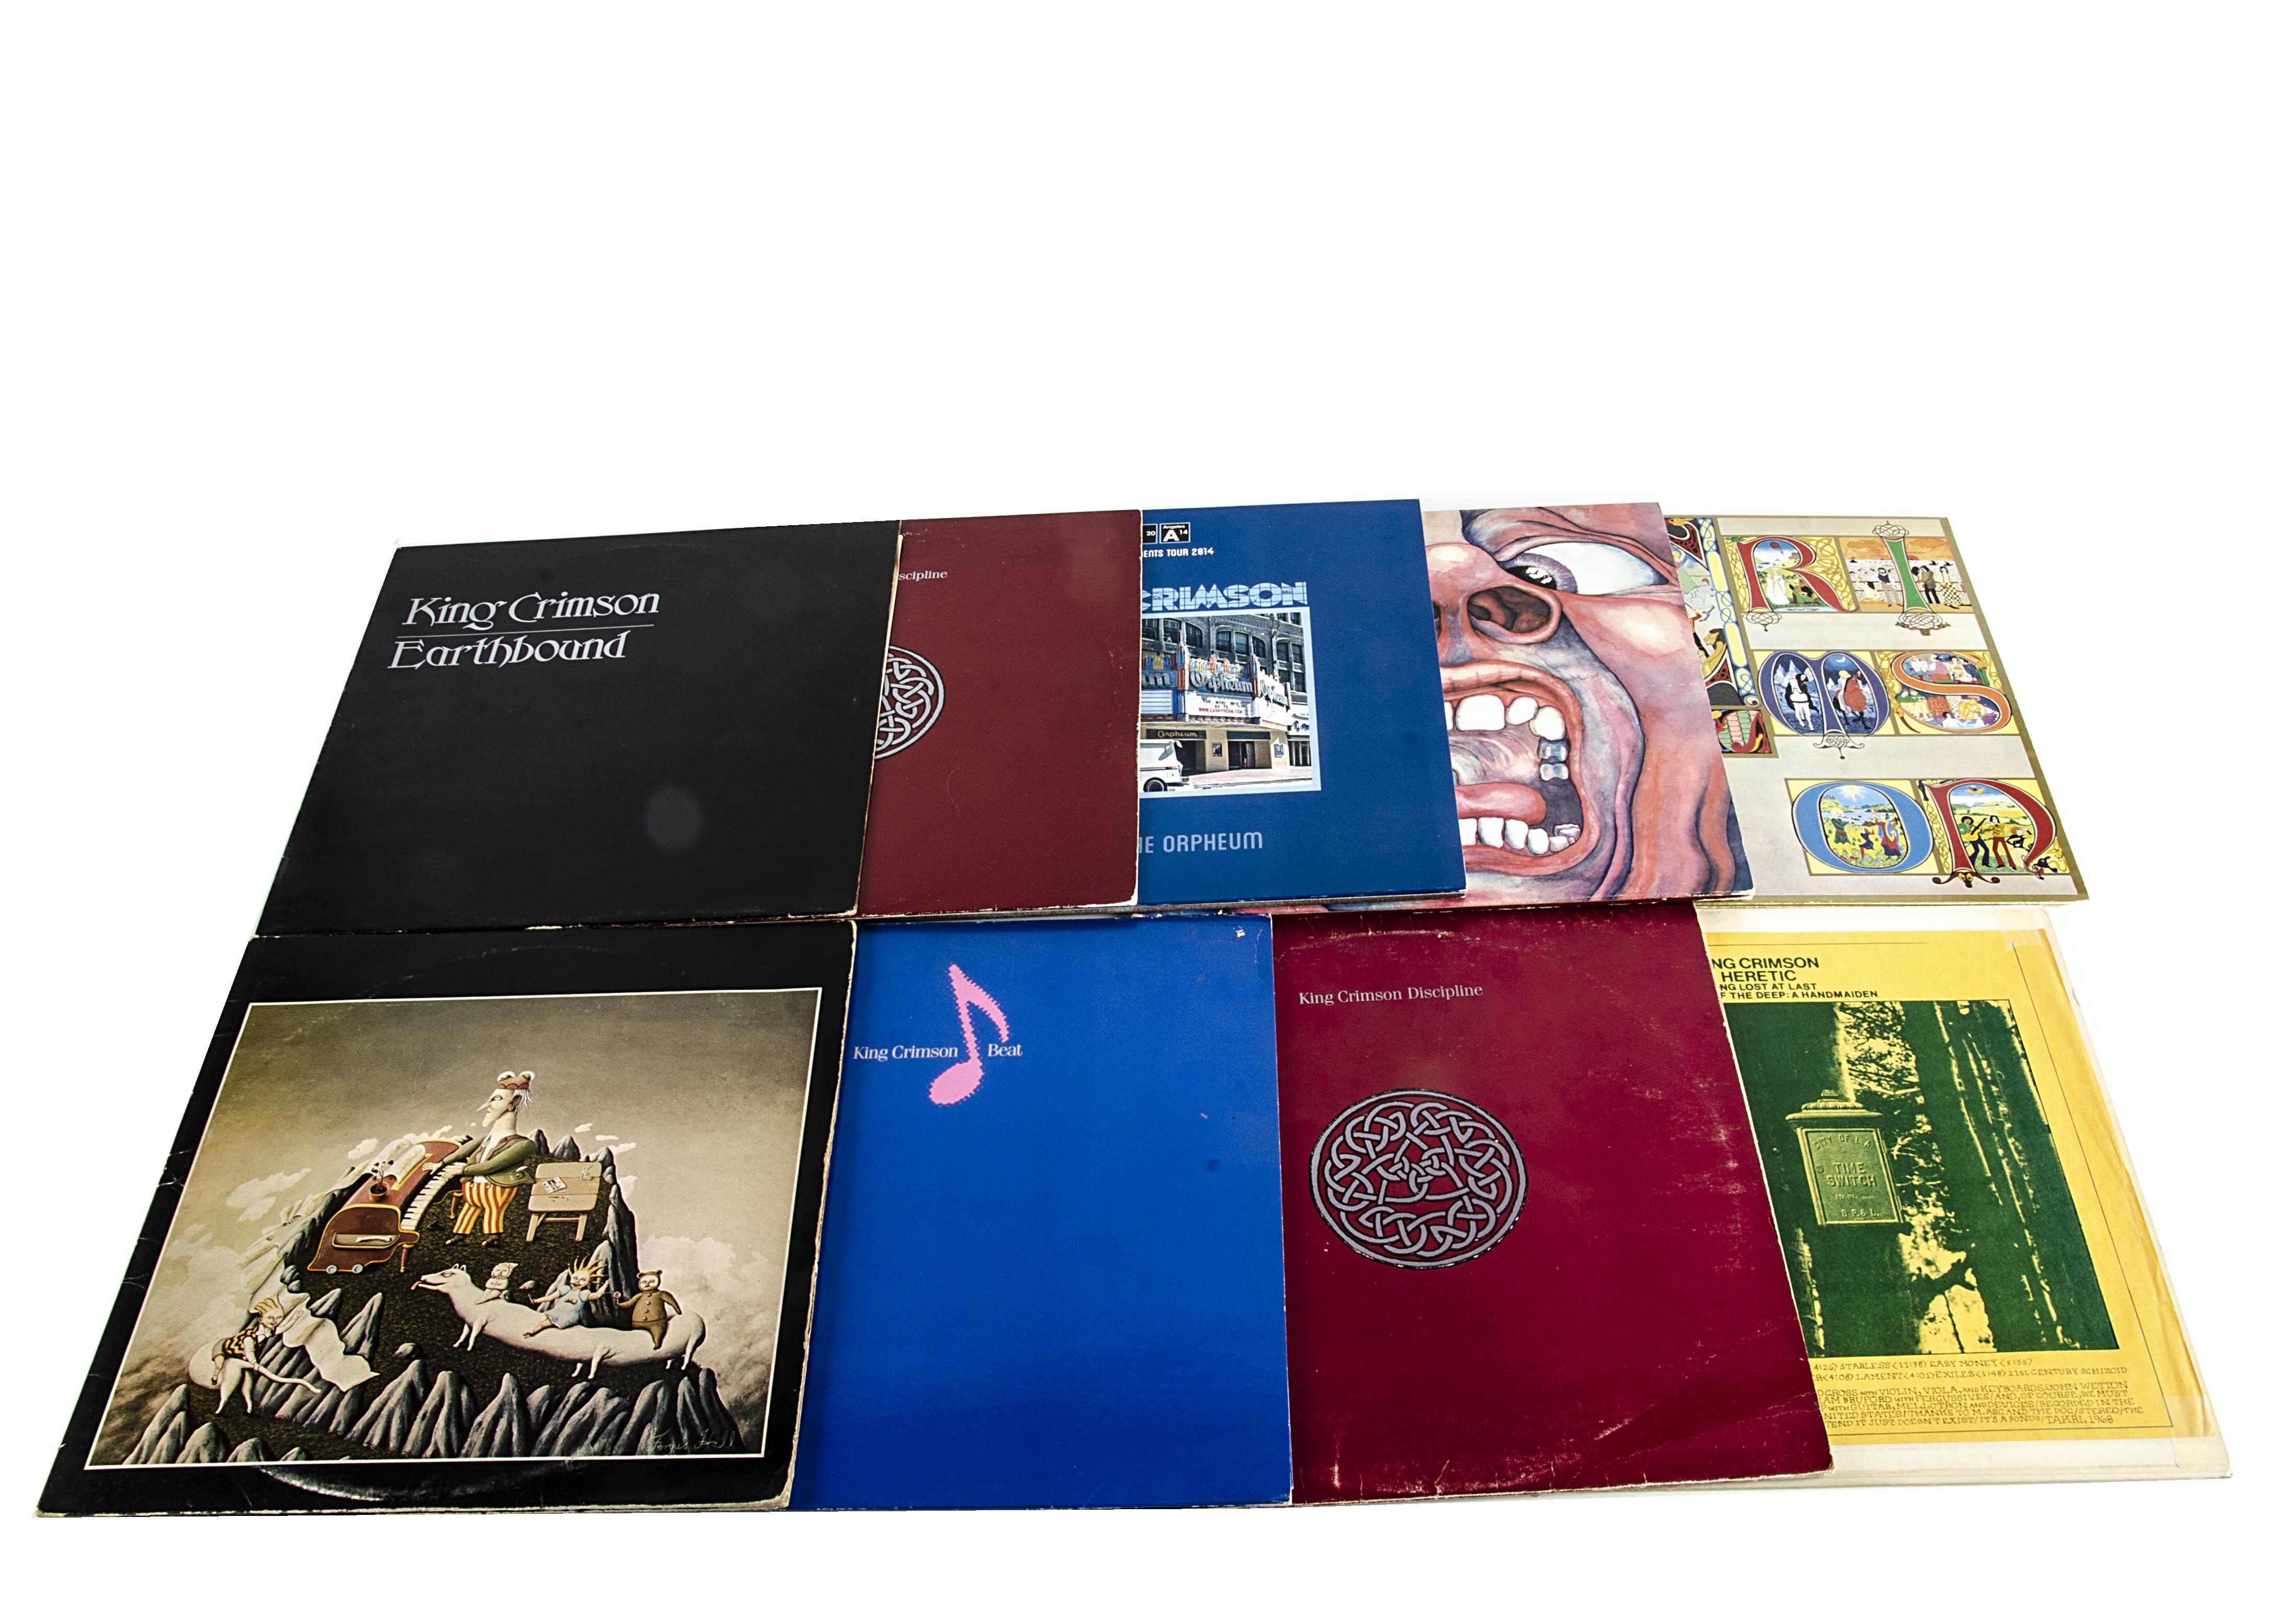 King Crimson LPs, nine albums comprising Earthbound, Discipline (2 copies), Beat, Lizard (